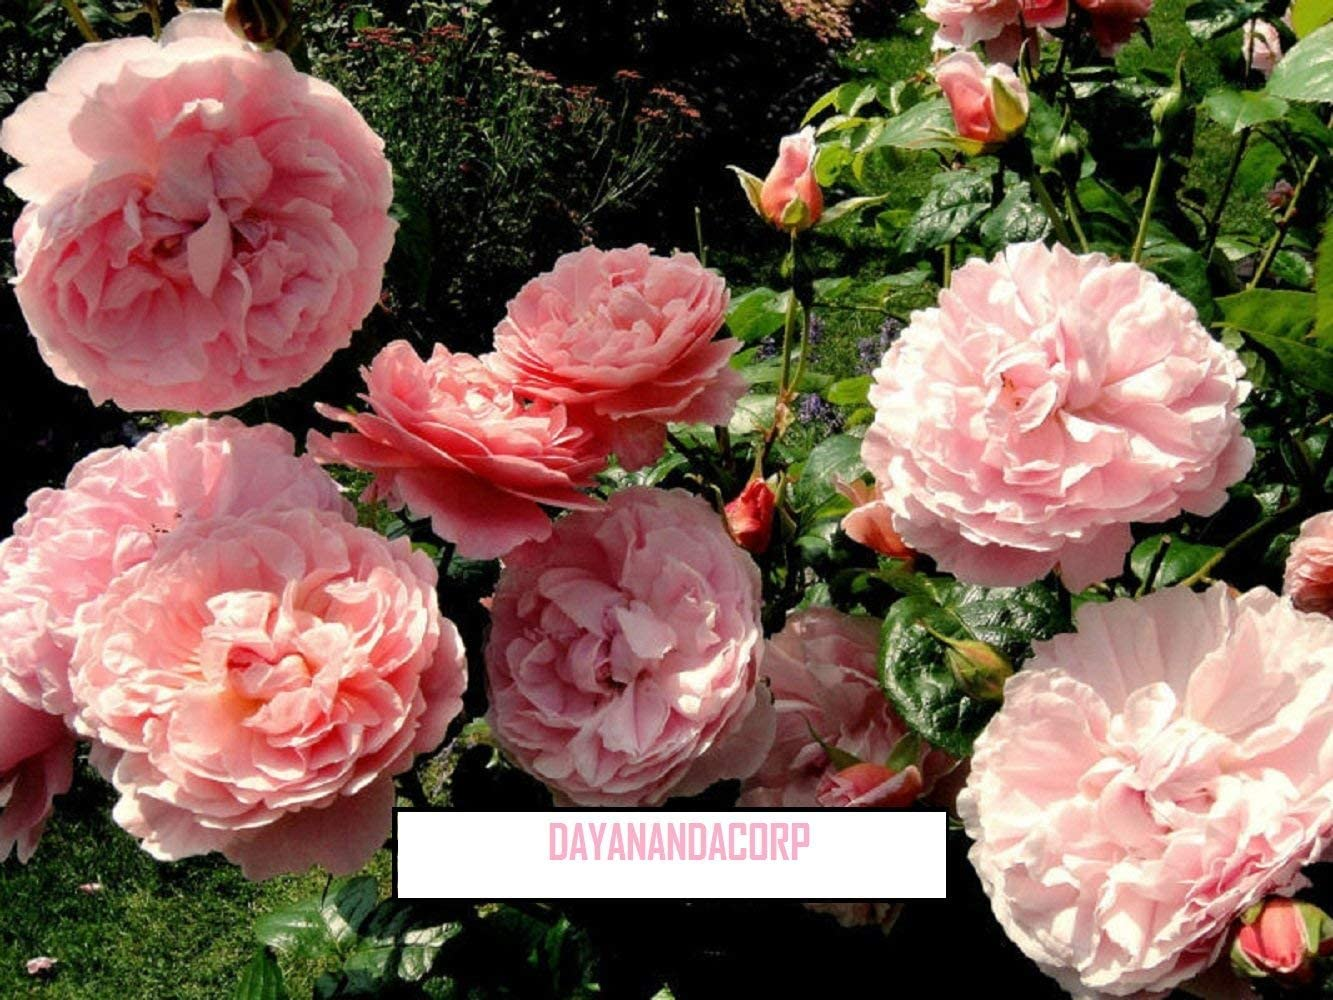 (100pcs Seeds)100 Strawberry Hill Rose Seeds Pink David Austin English English Rose Bonsai Flower and Garden Plants Seeds